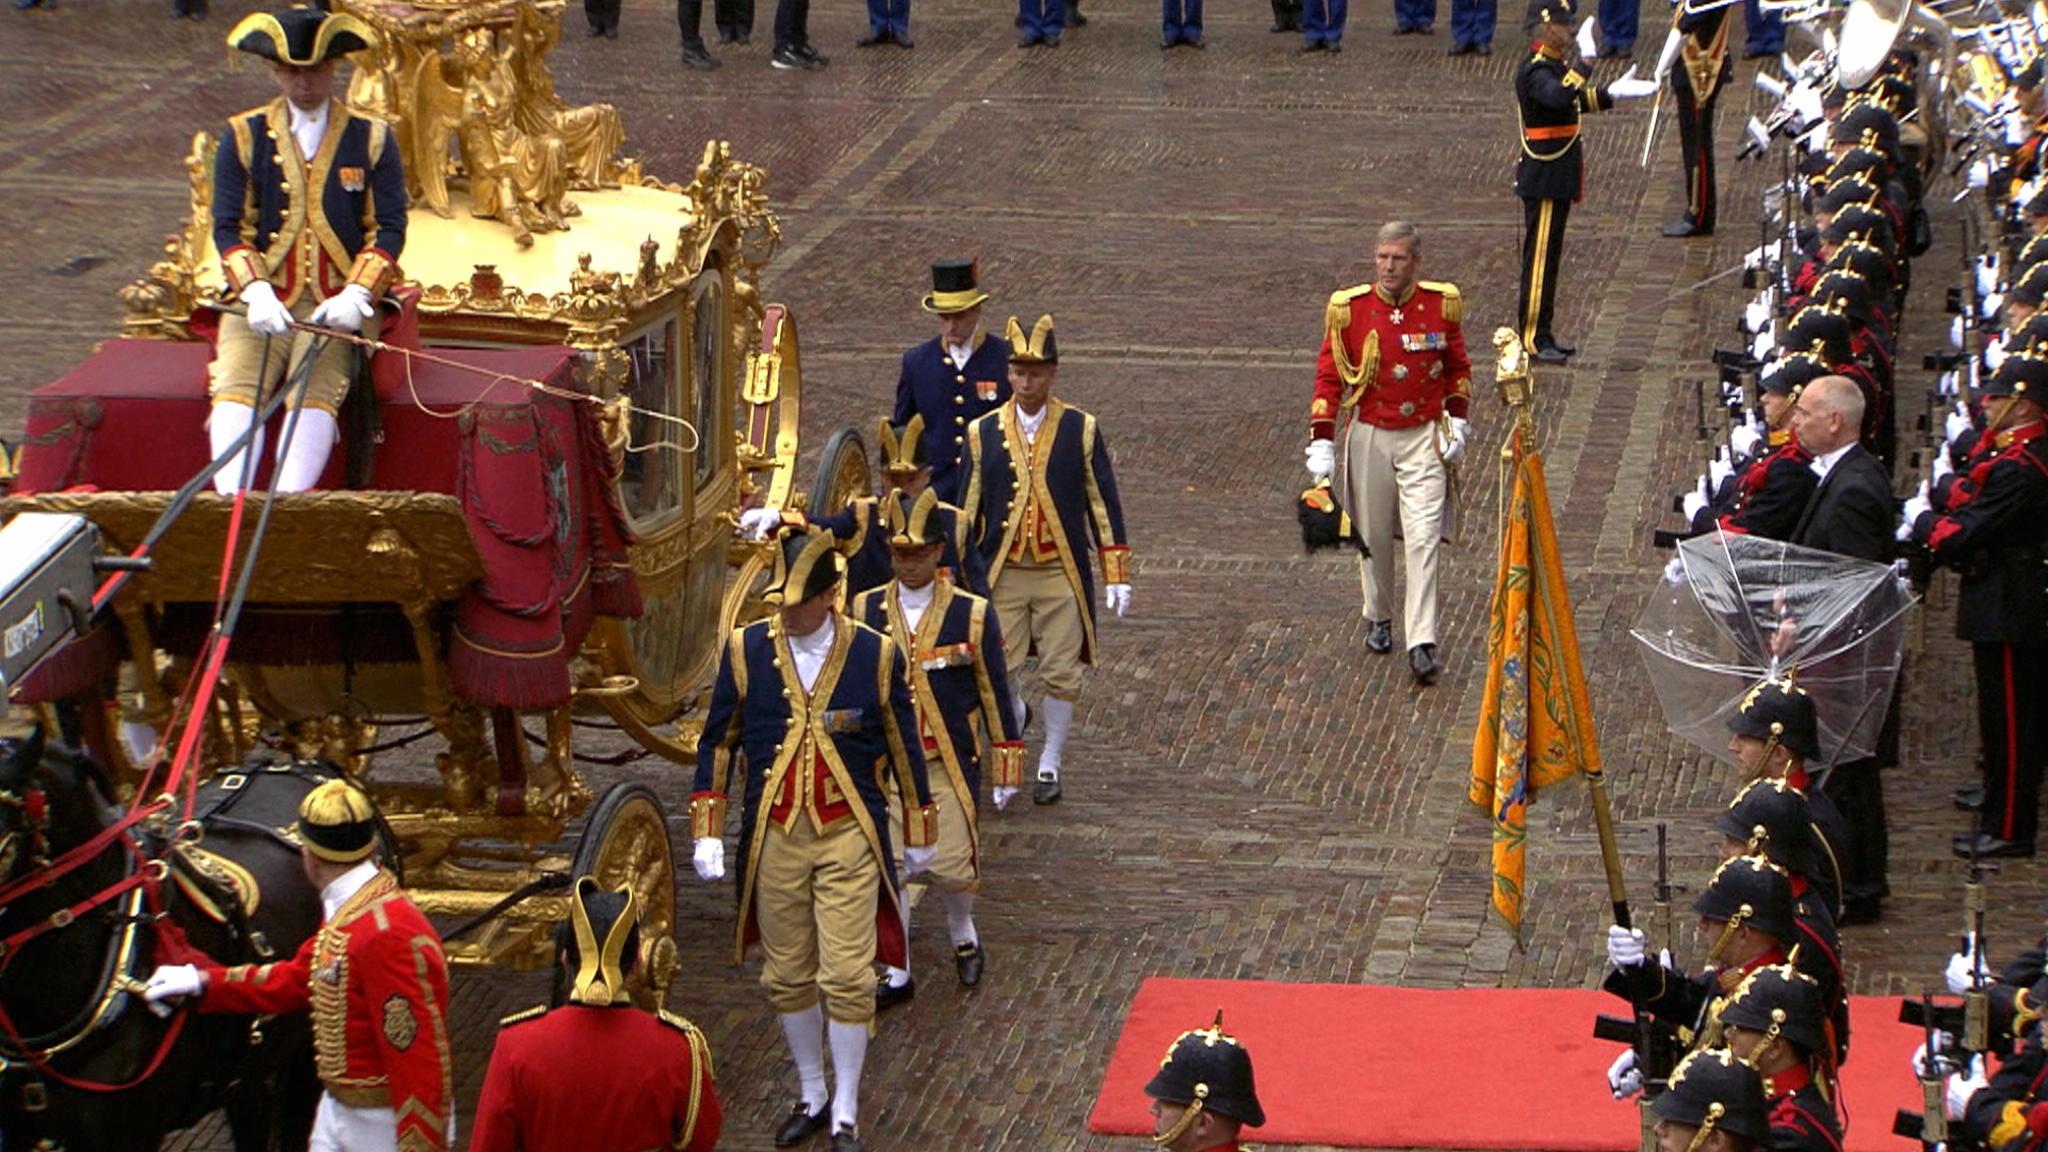 Aankomst koning en koningin bij Ridderzaal   NOS